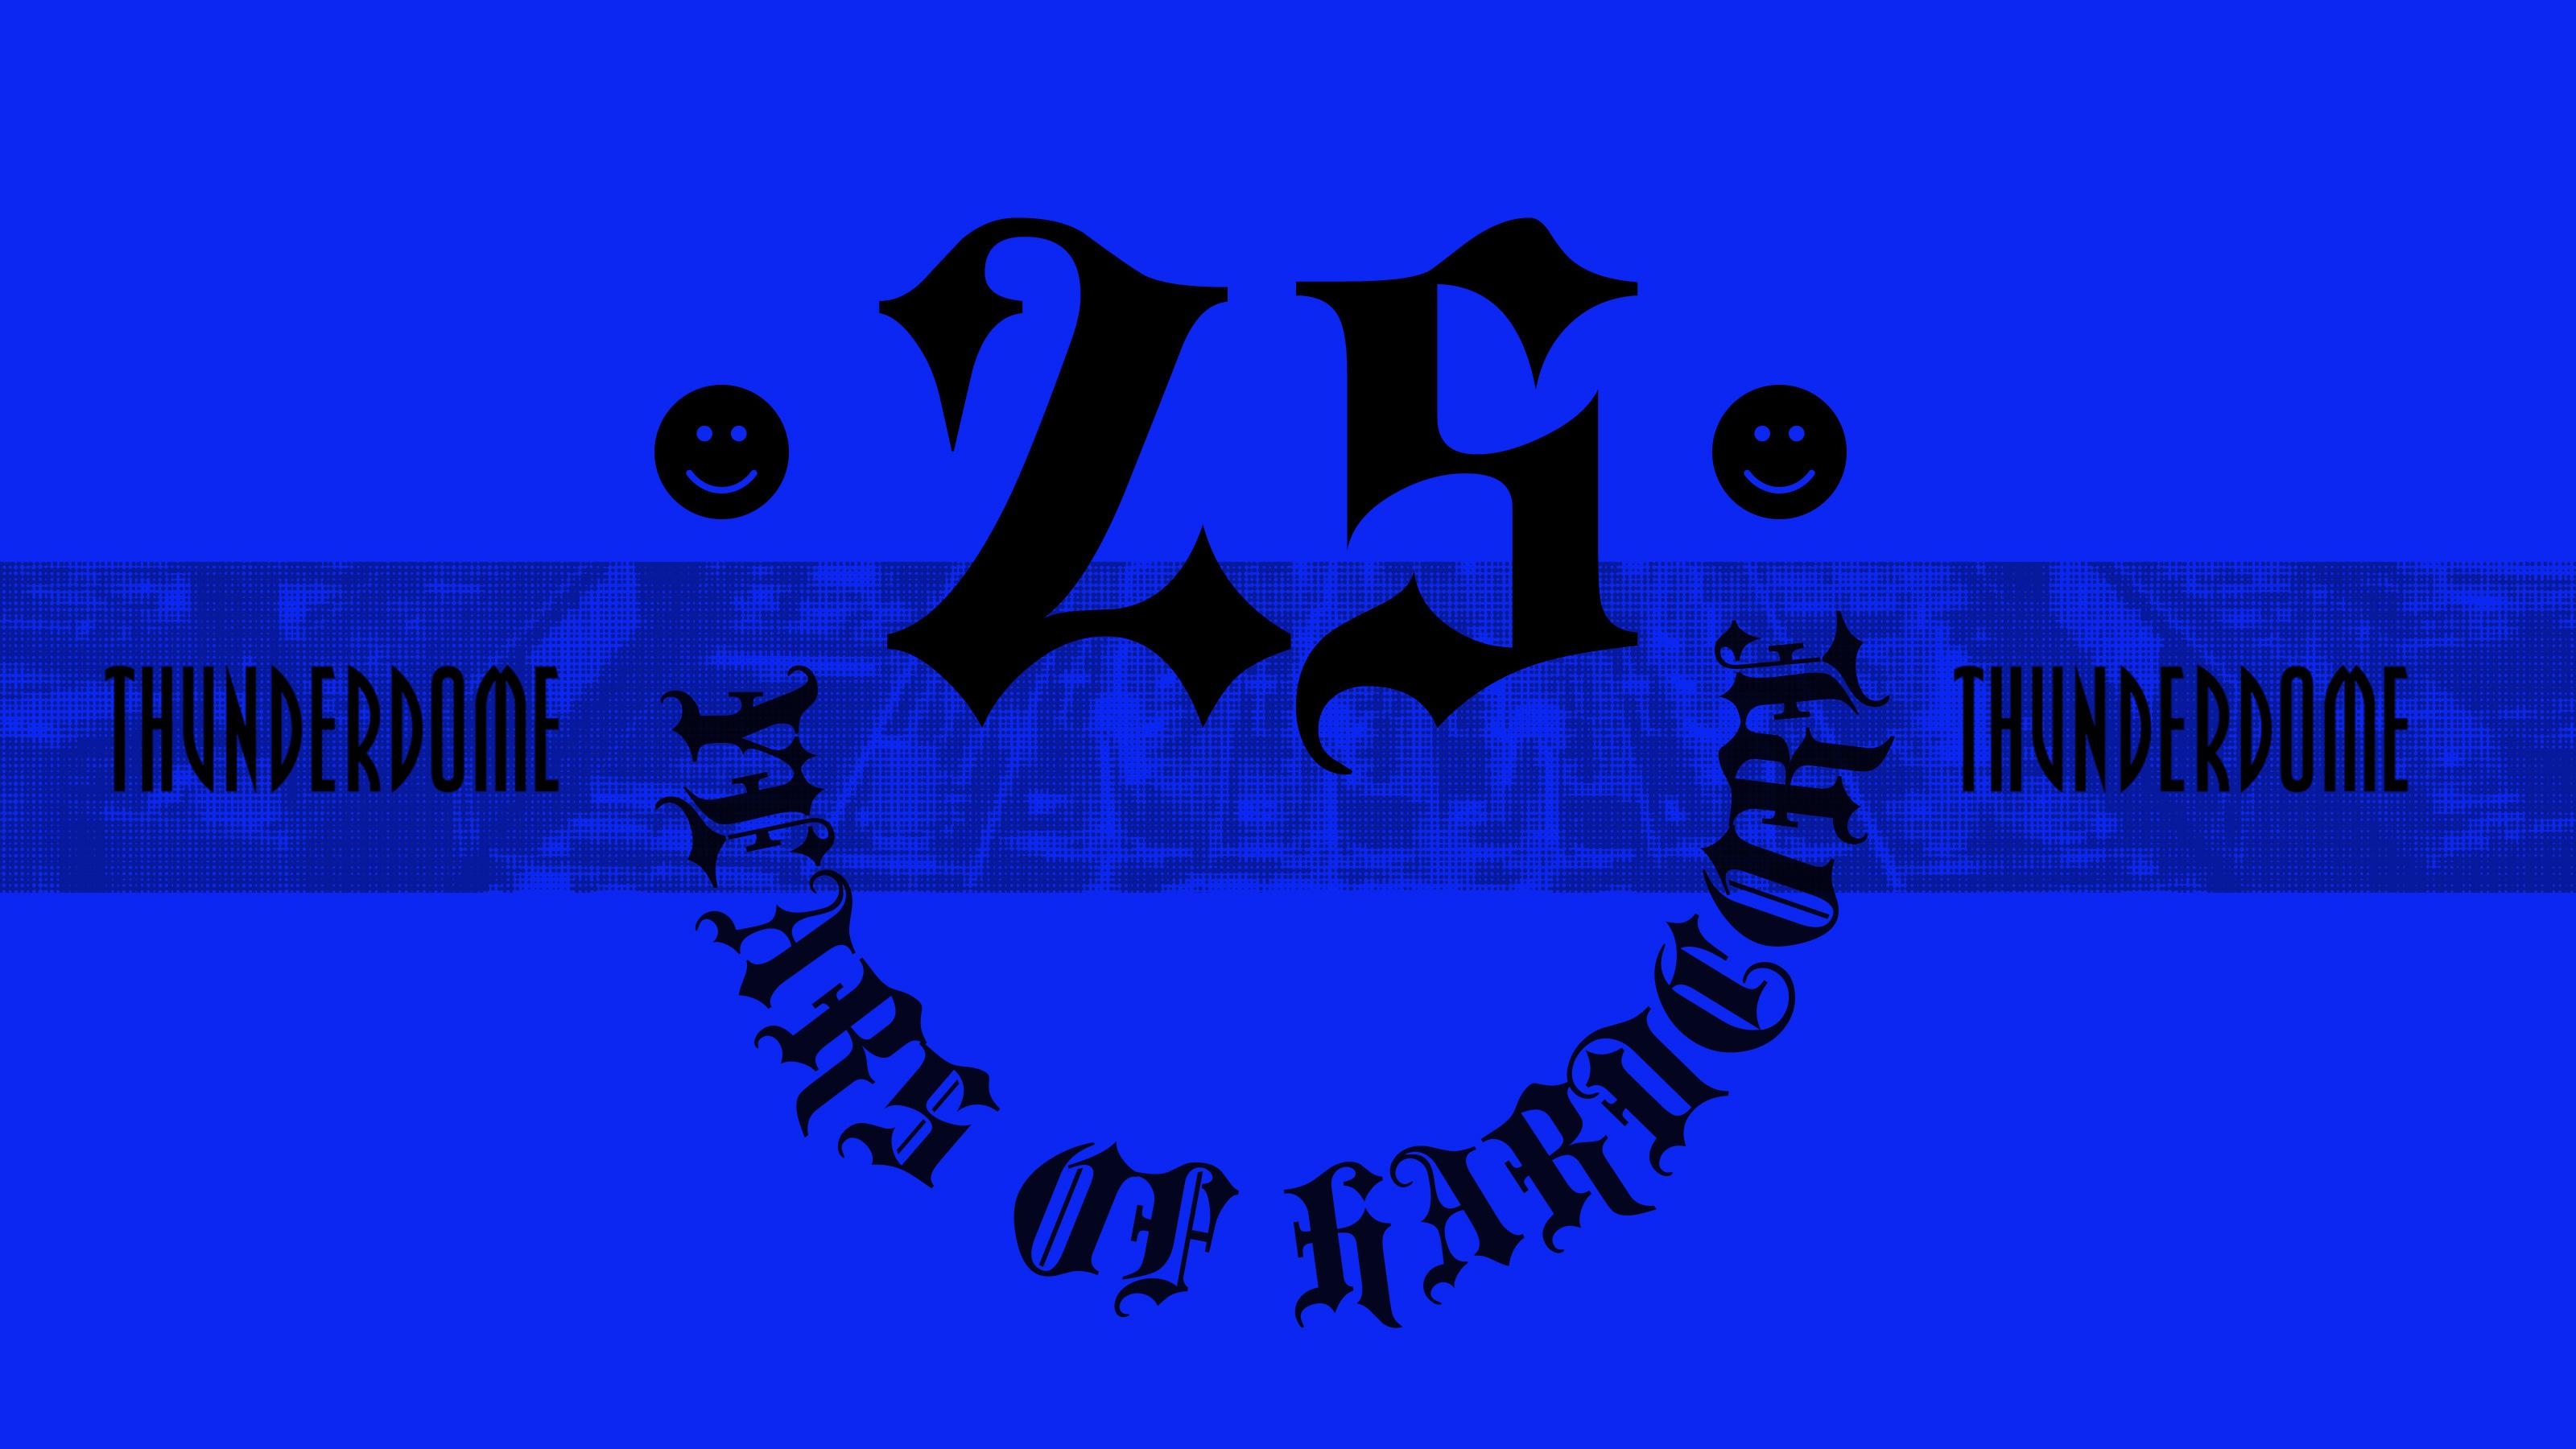 Thunderdome: 25 years of hardcore